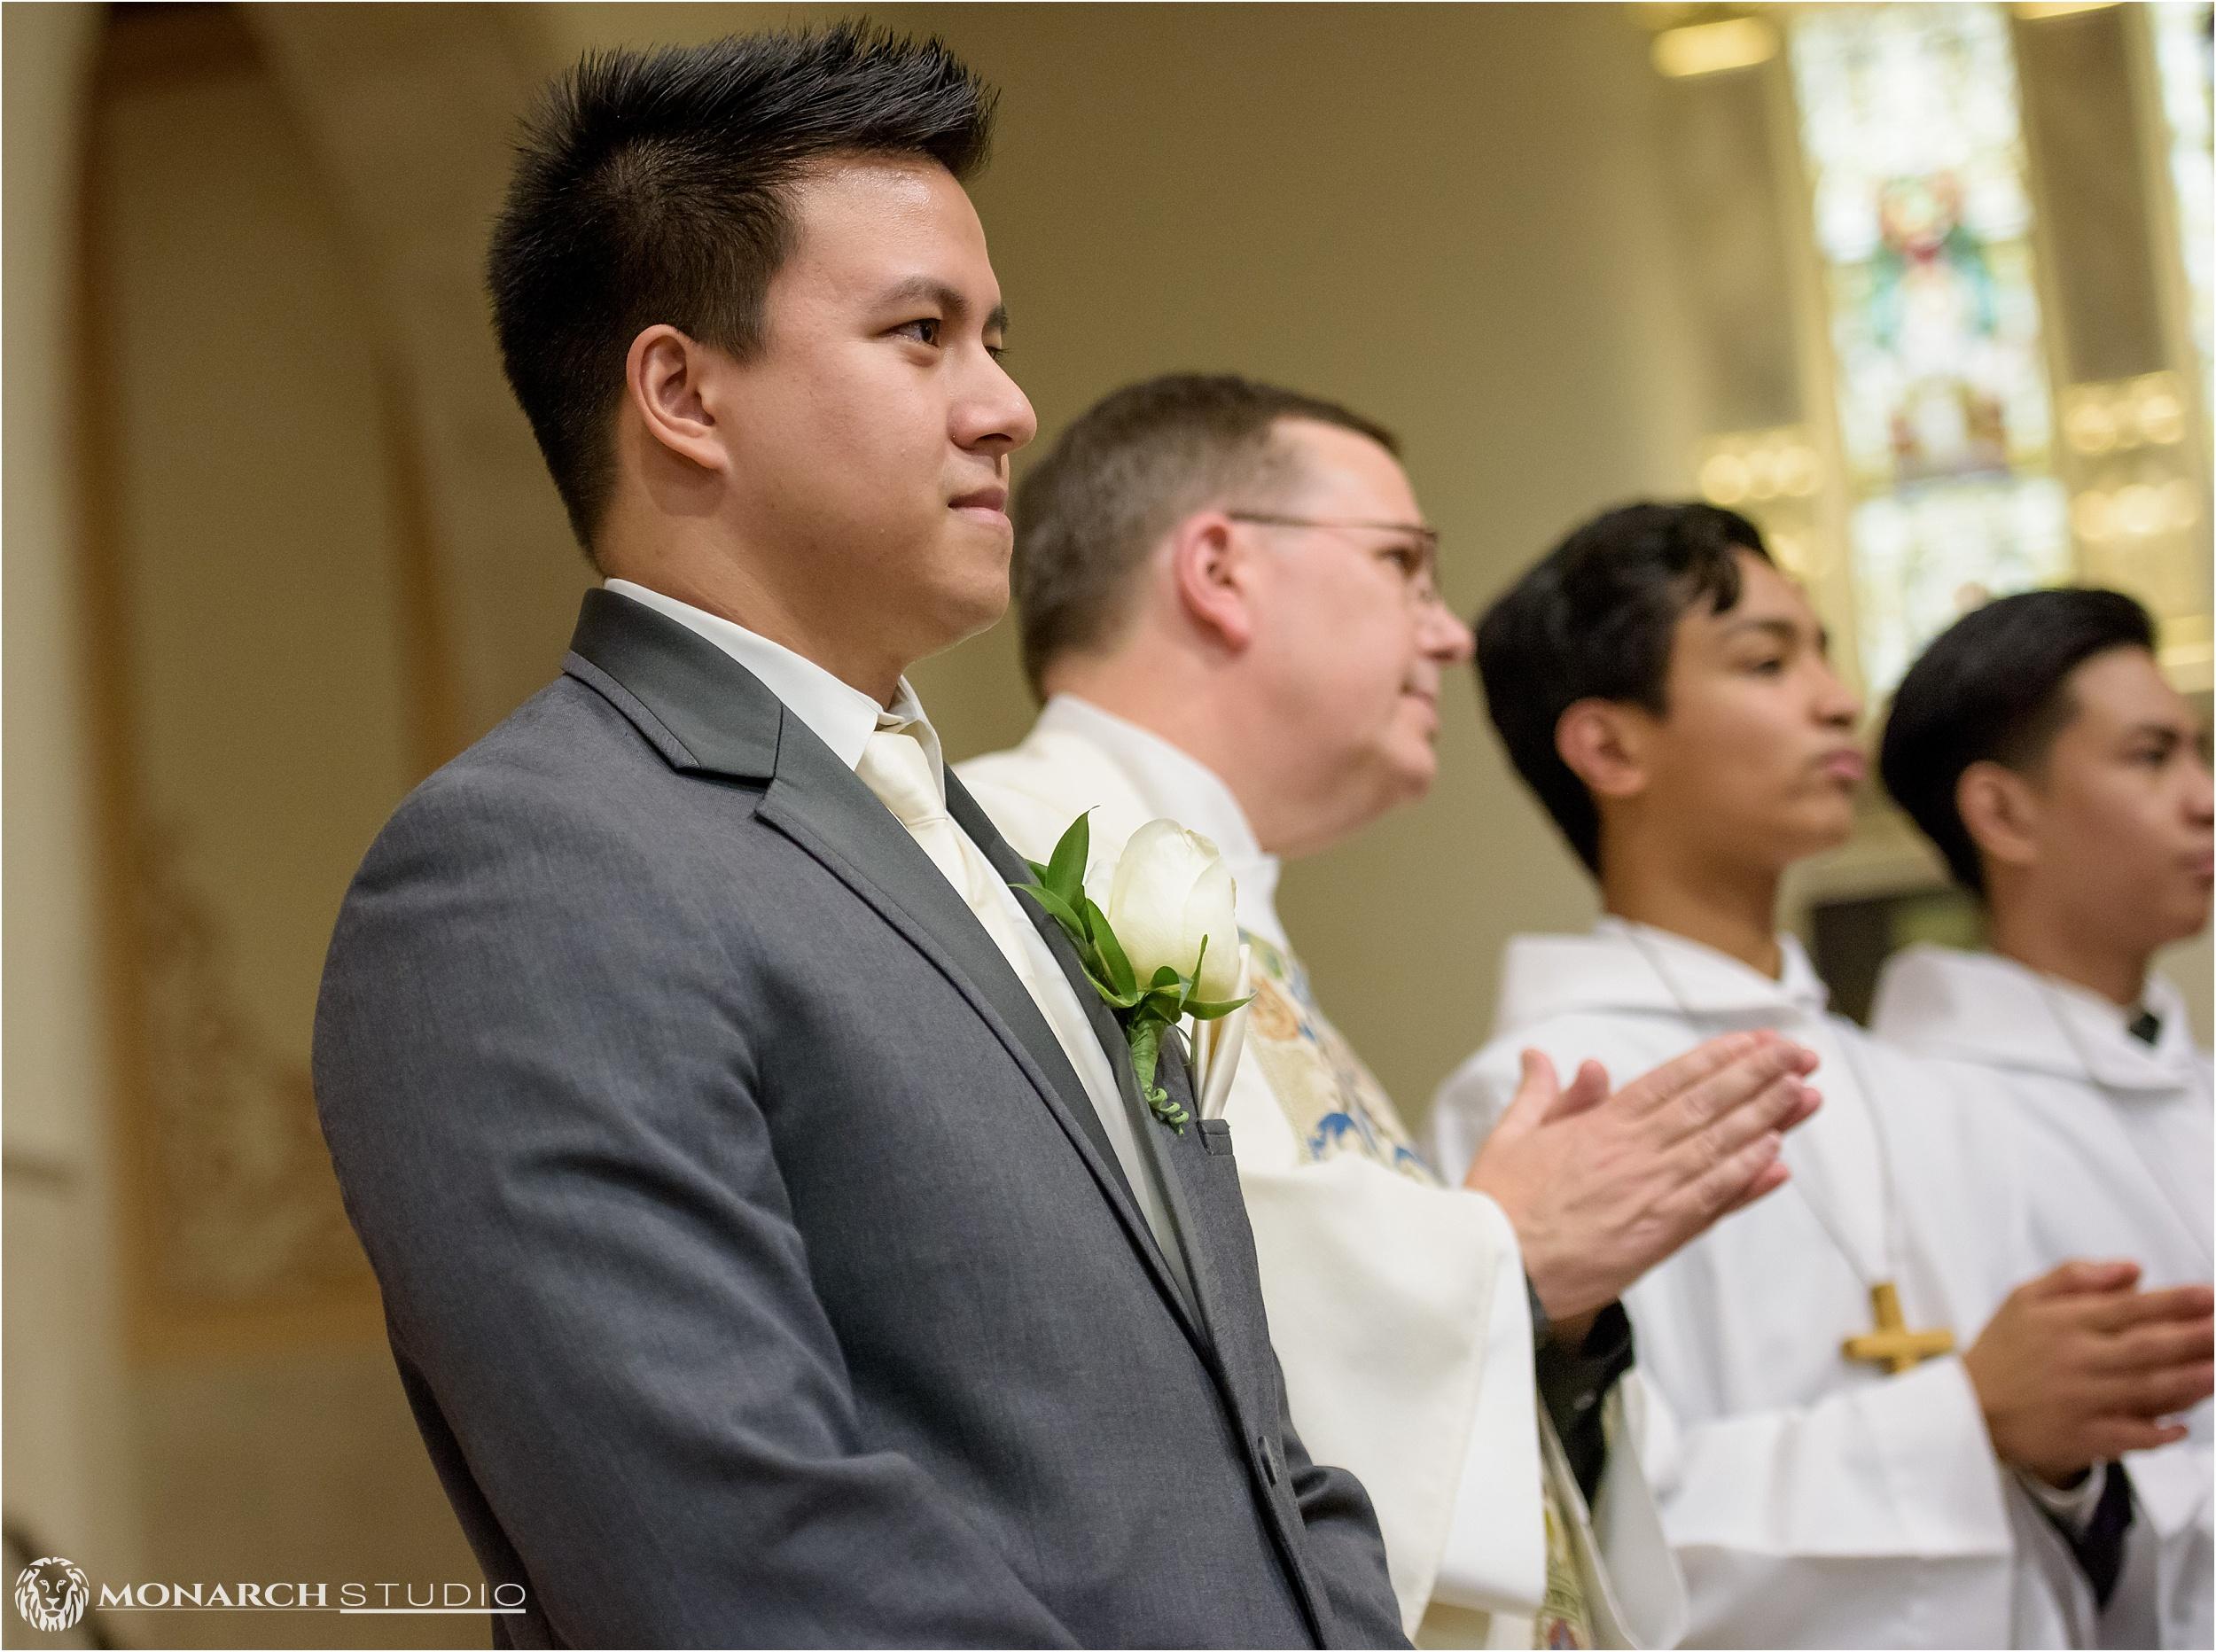 wedding-photographer-in-st-augustine-florida-treasury-032.jpg